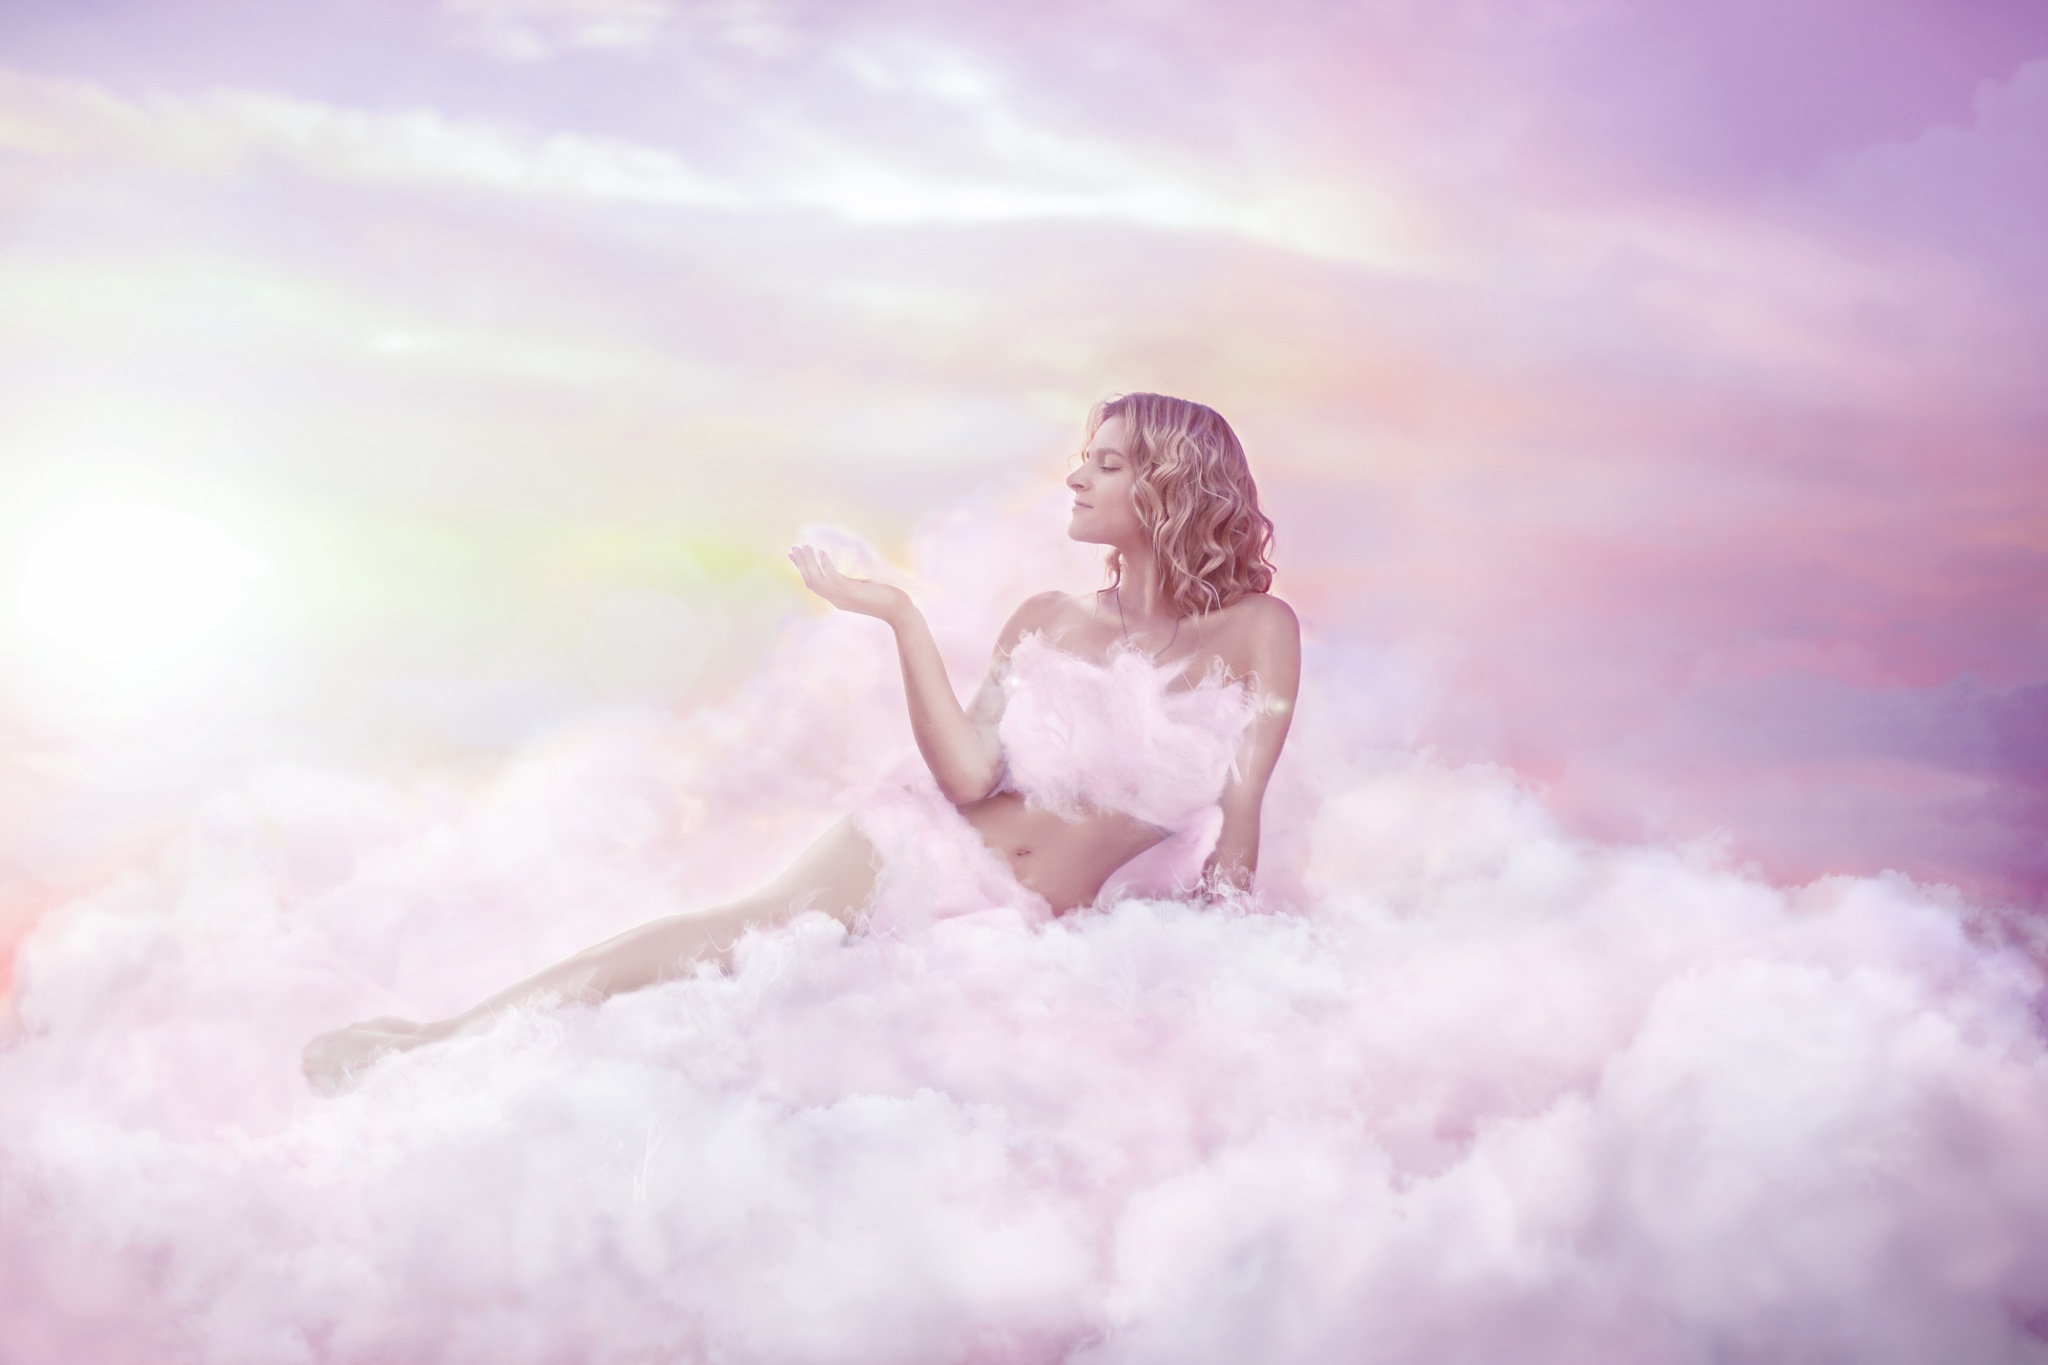 Cloud №9 by Alexey Vladimir